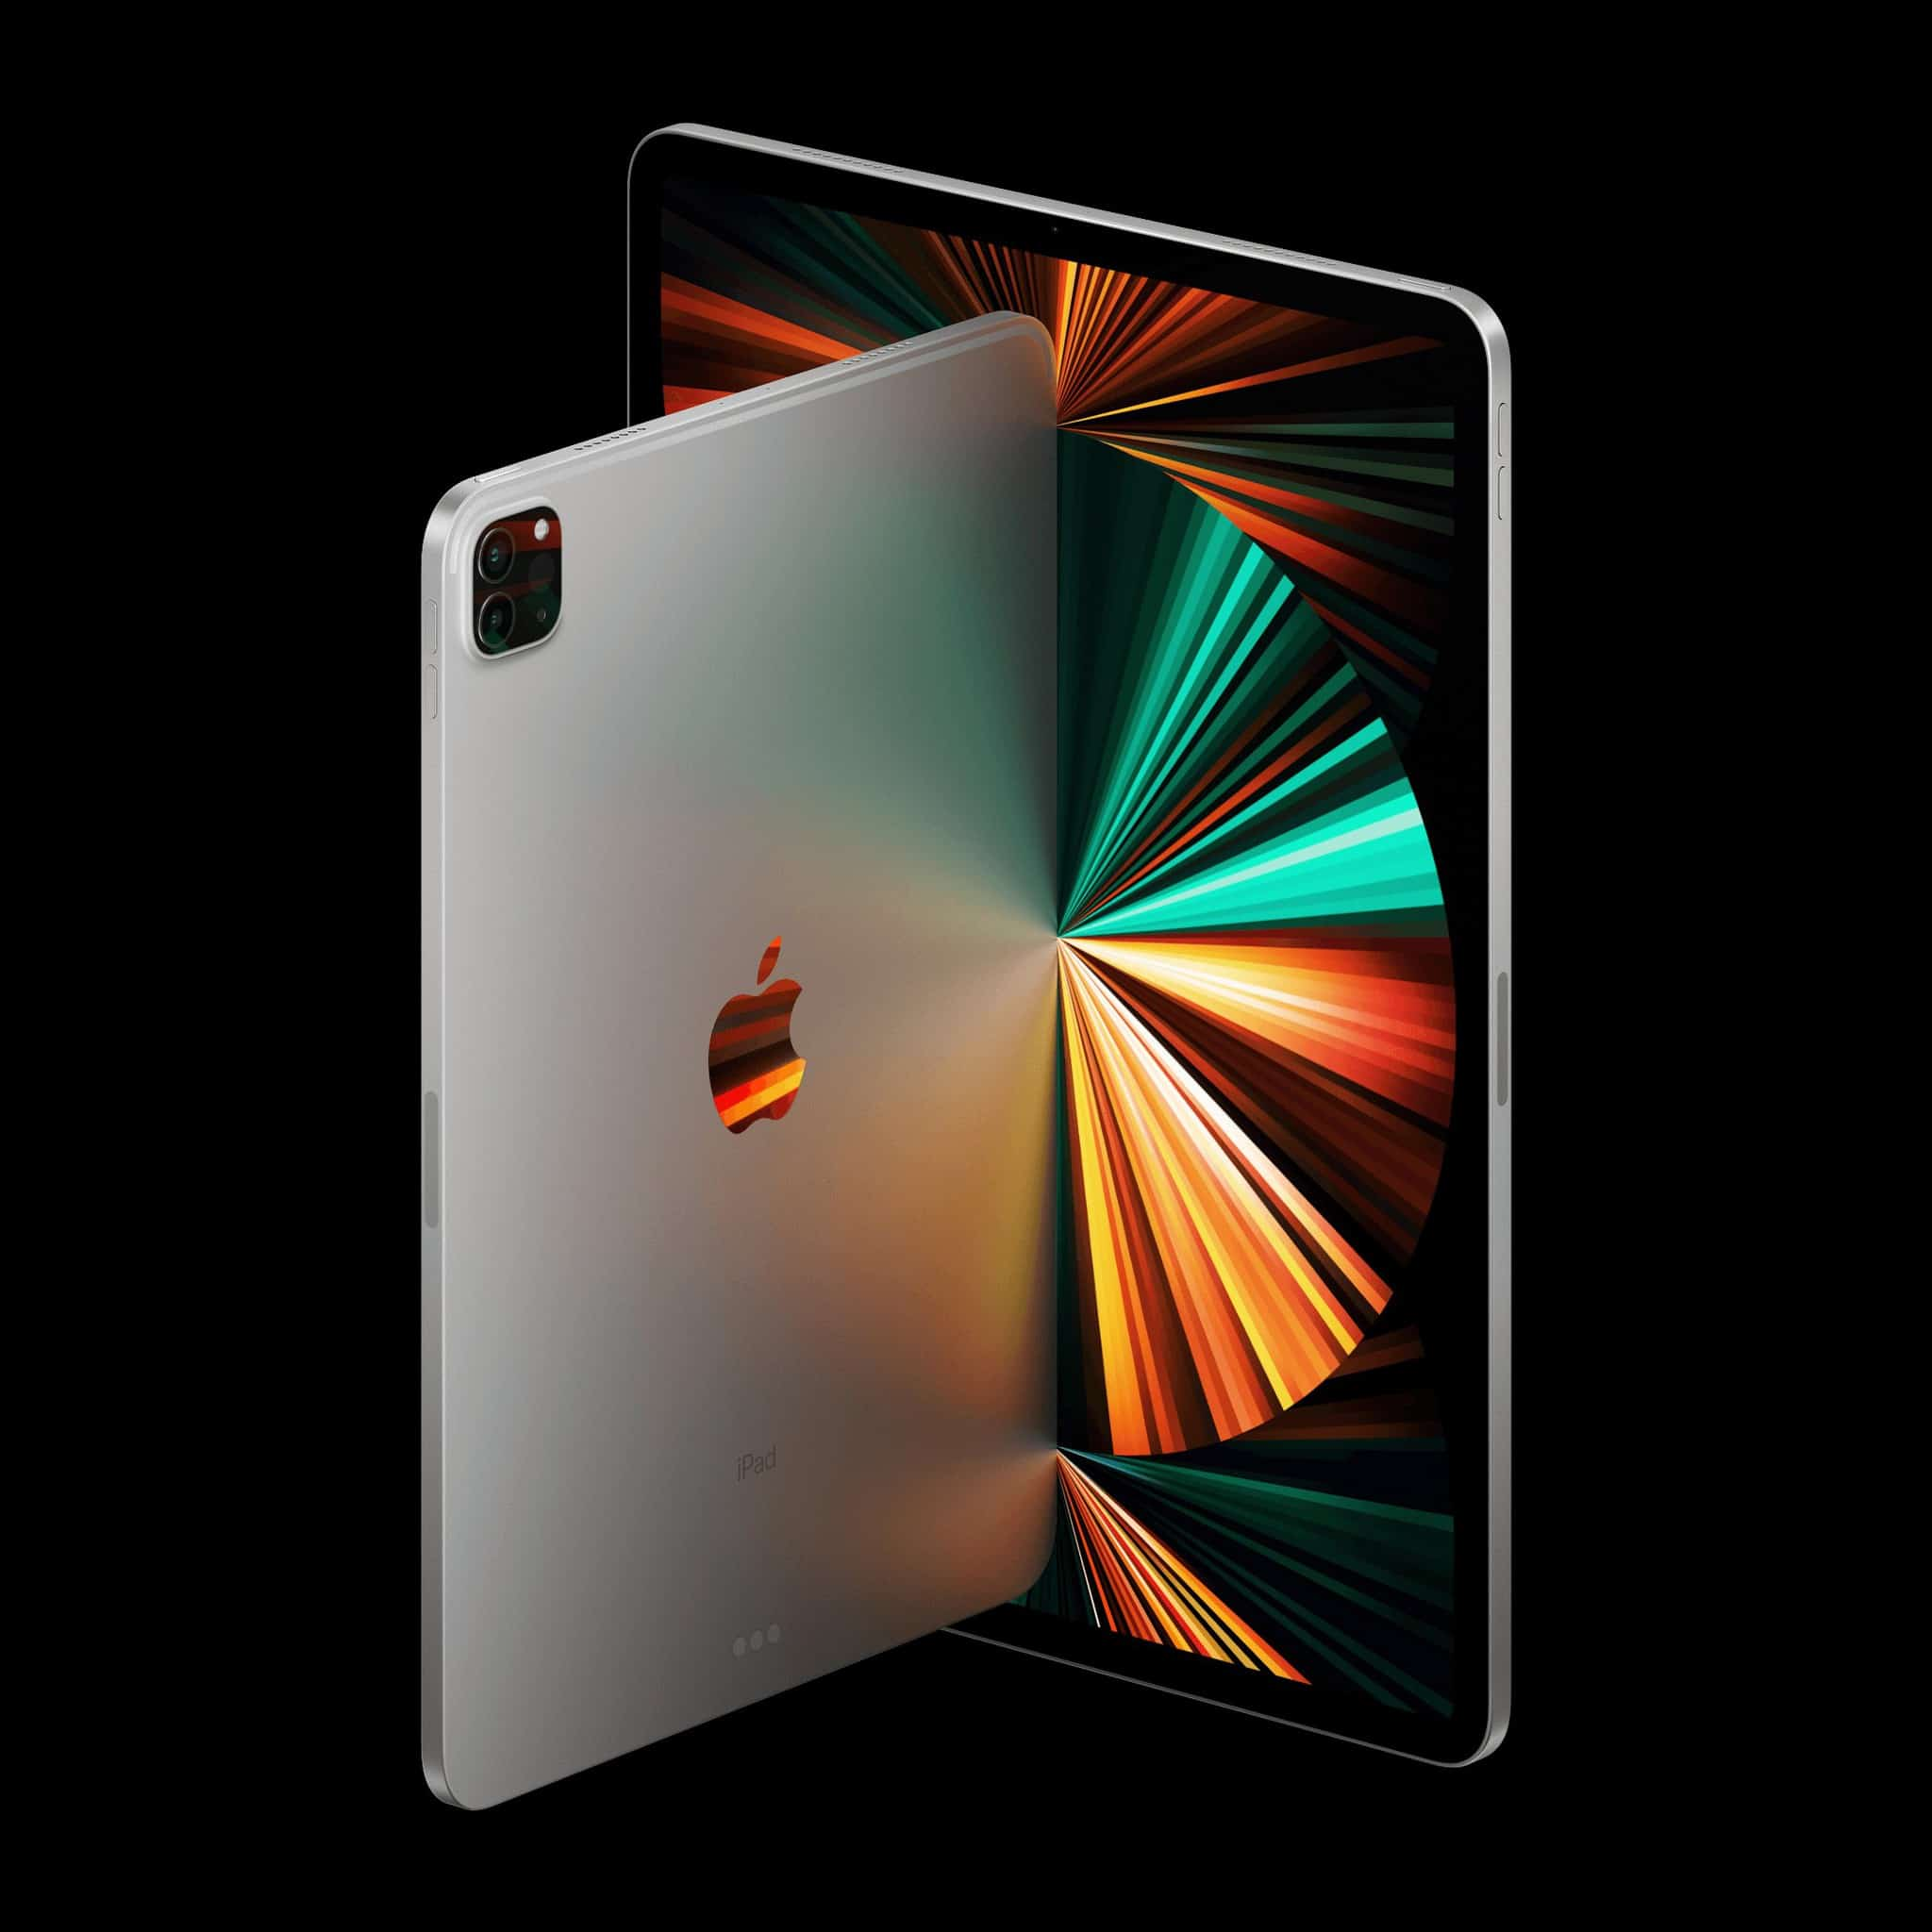 new Imac iPad Pro 2021